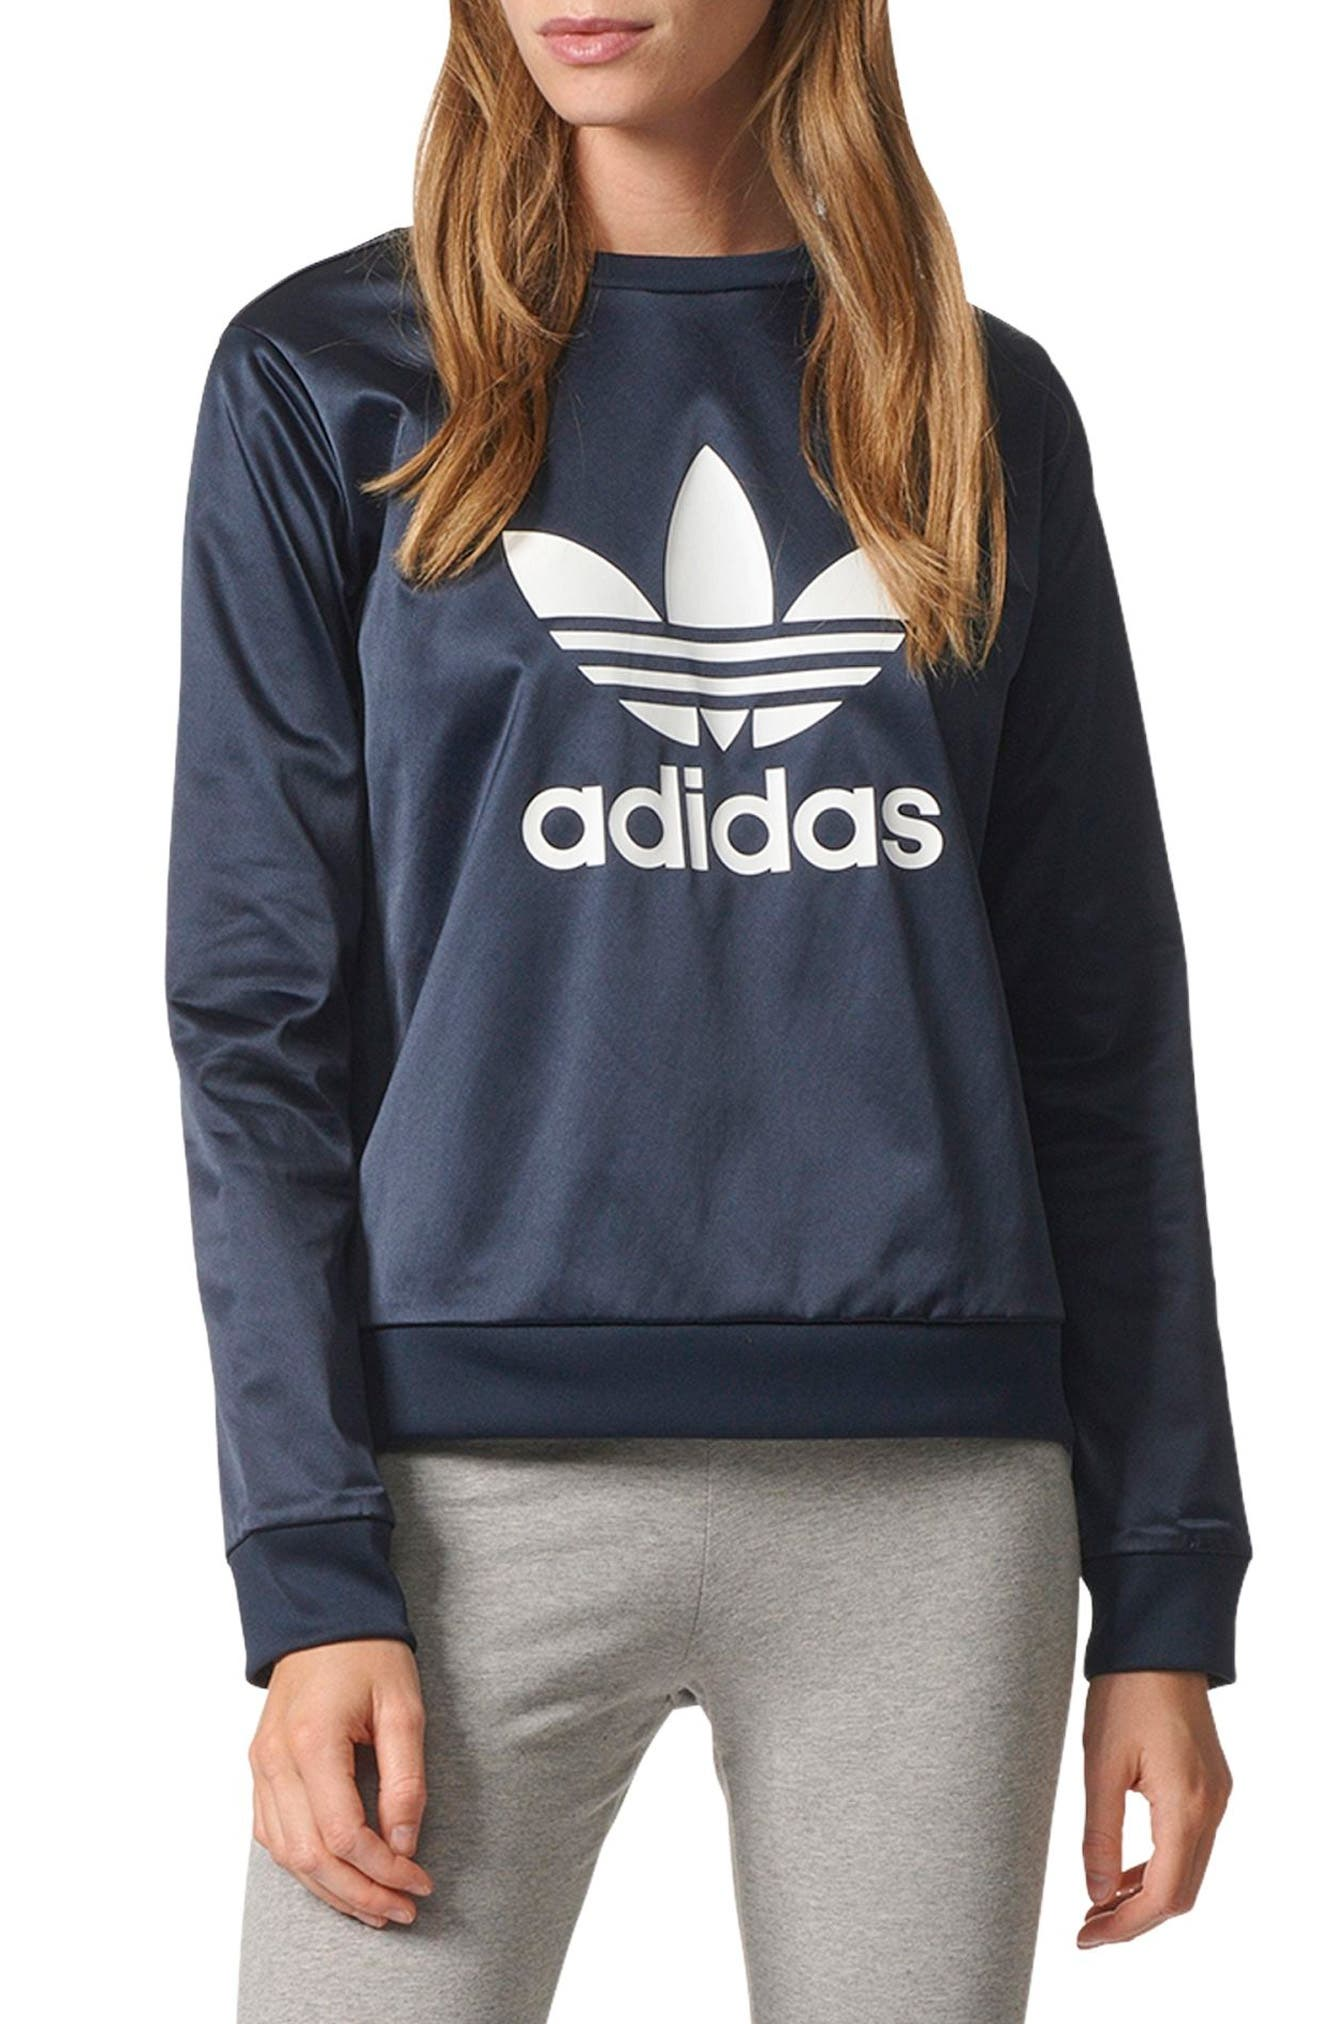 Women's Adidas Tops & Tees | Nordstrom